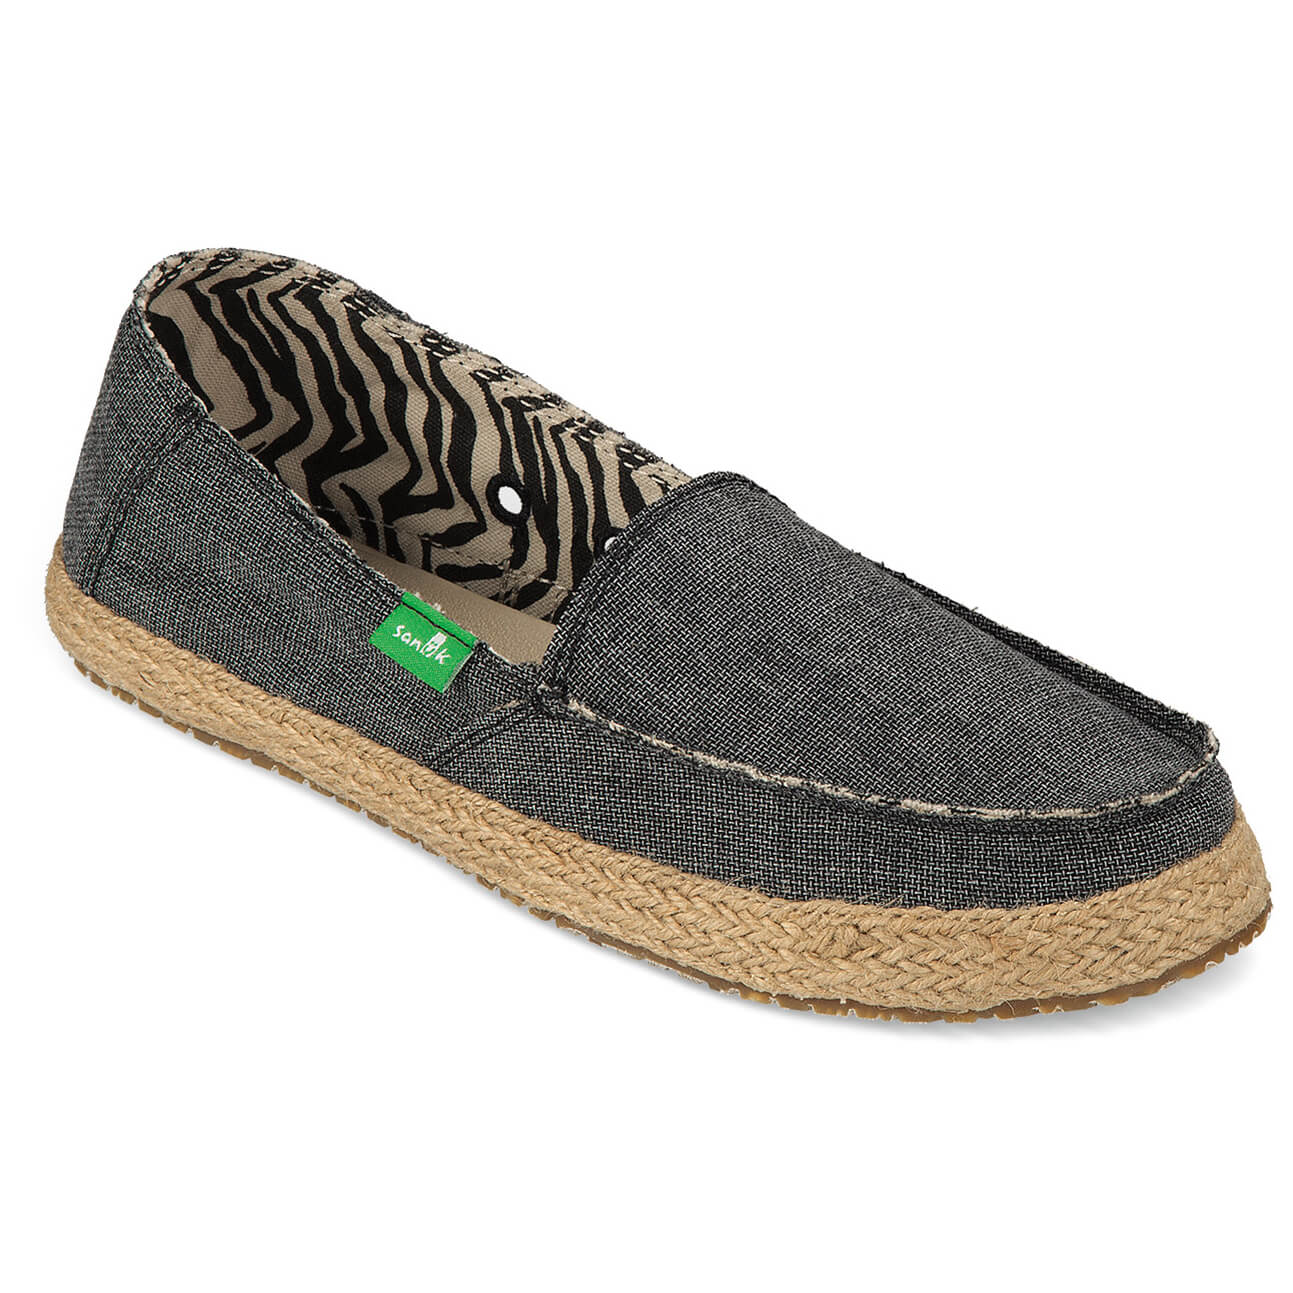 Sanuk - Women's Fiona - Sneaker Charcoal